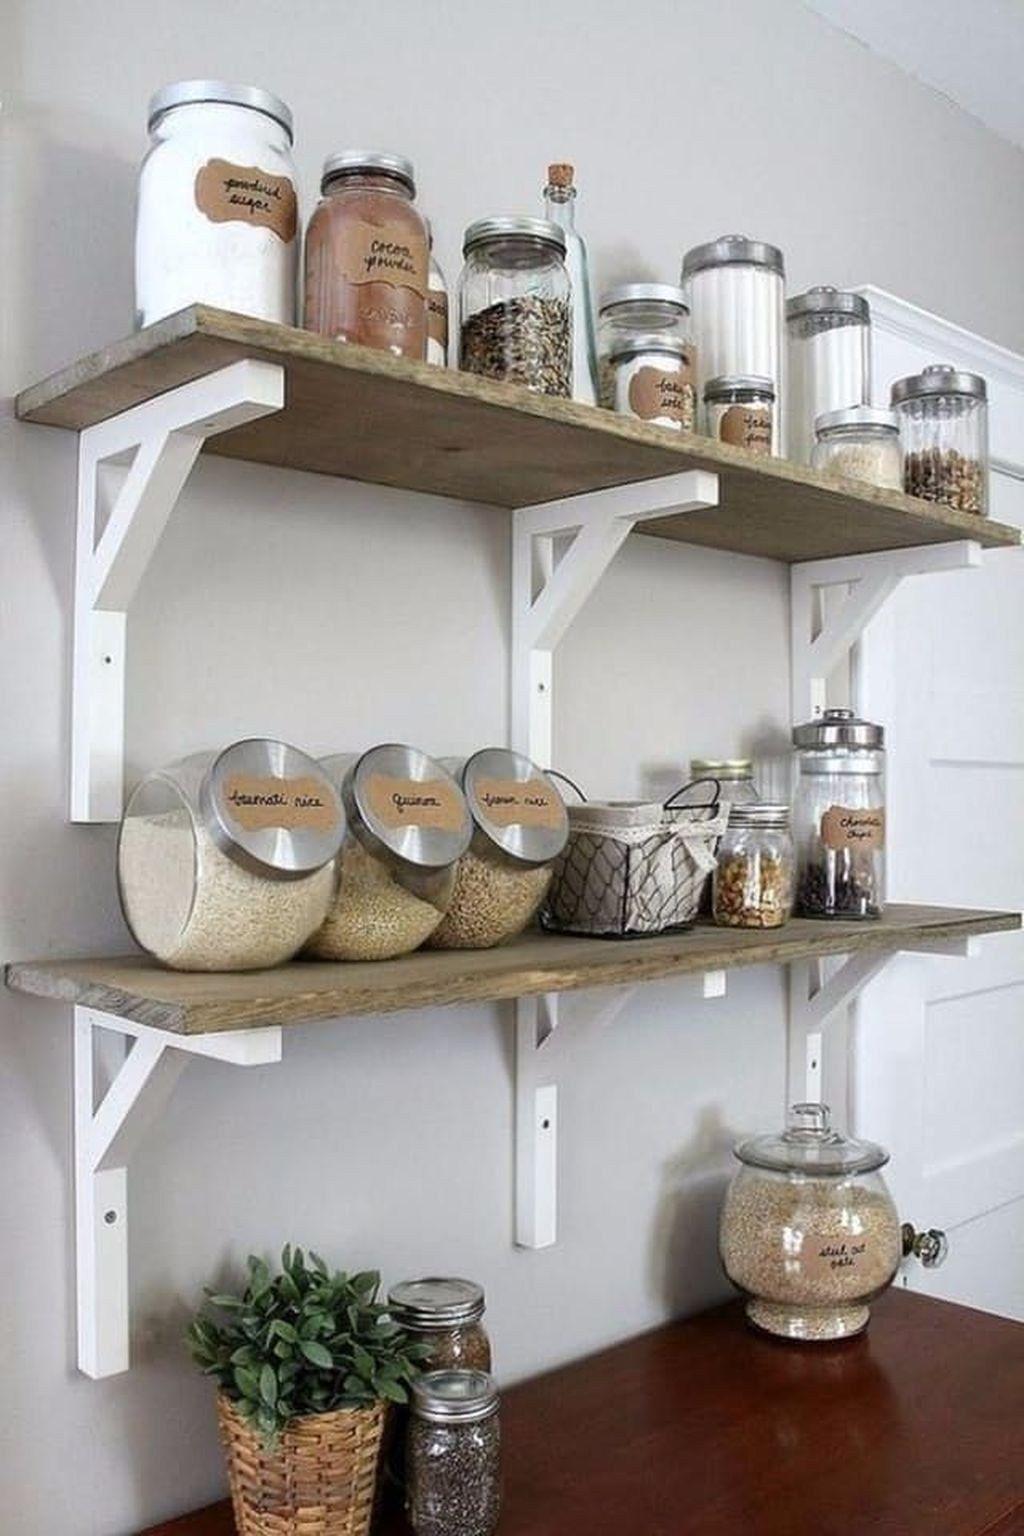 Amazing Diy Farmhouse Home Decor Ideas On A Budget 50 Budgetkitchenhomedecoratingideas Diy Kitchen Decor Farmhouse Kitchen Decor Kitchen Decor Collections